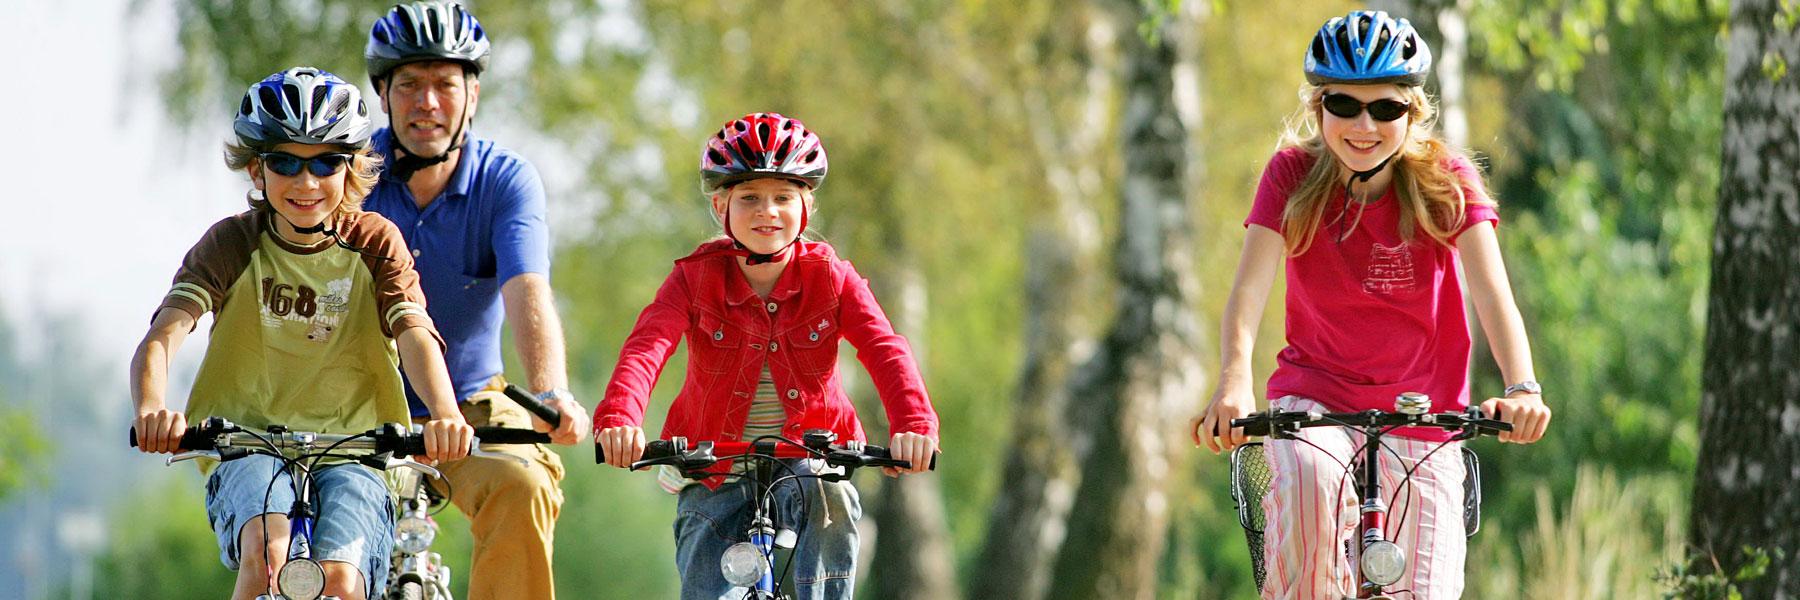 Fahrradtour - Jugendherberge Teterow